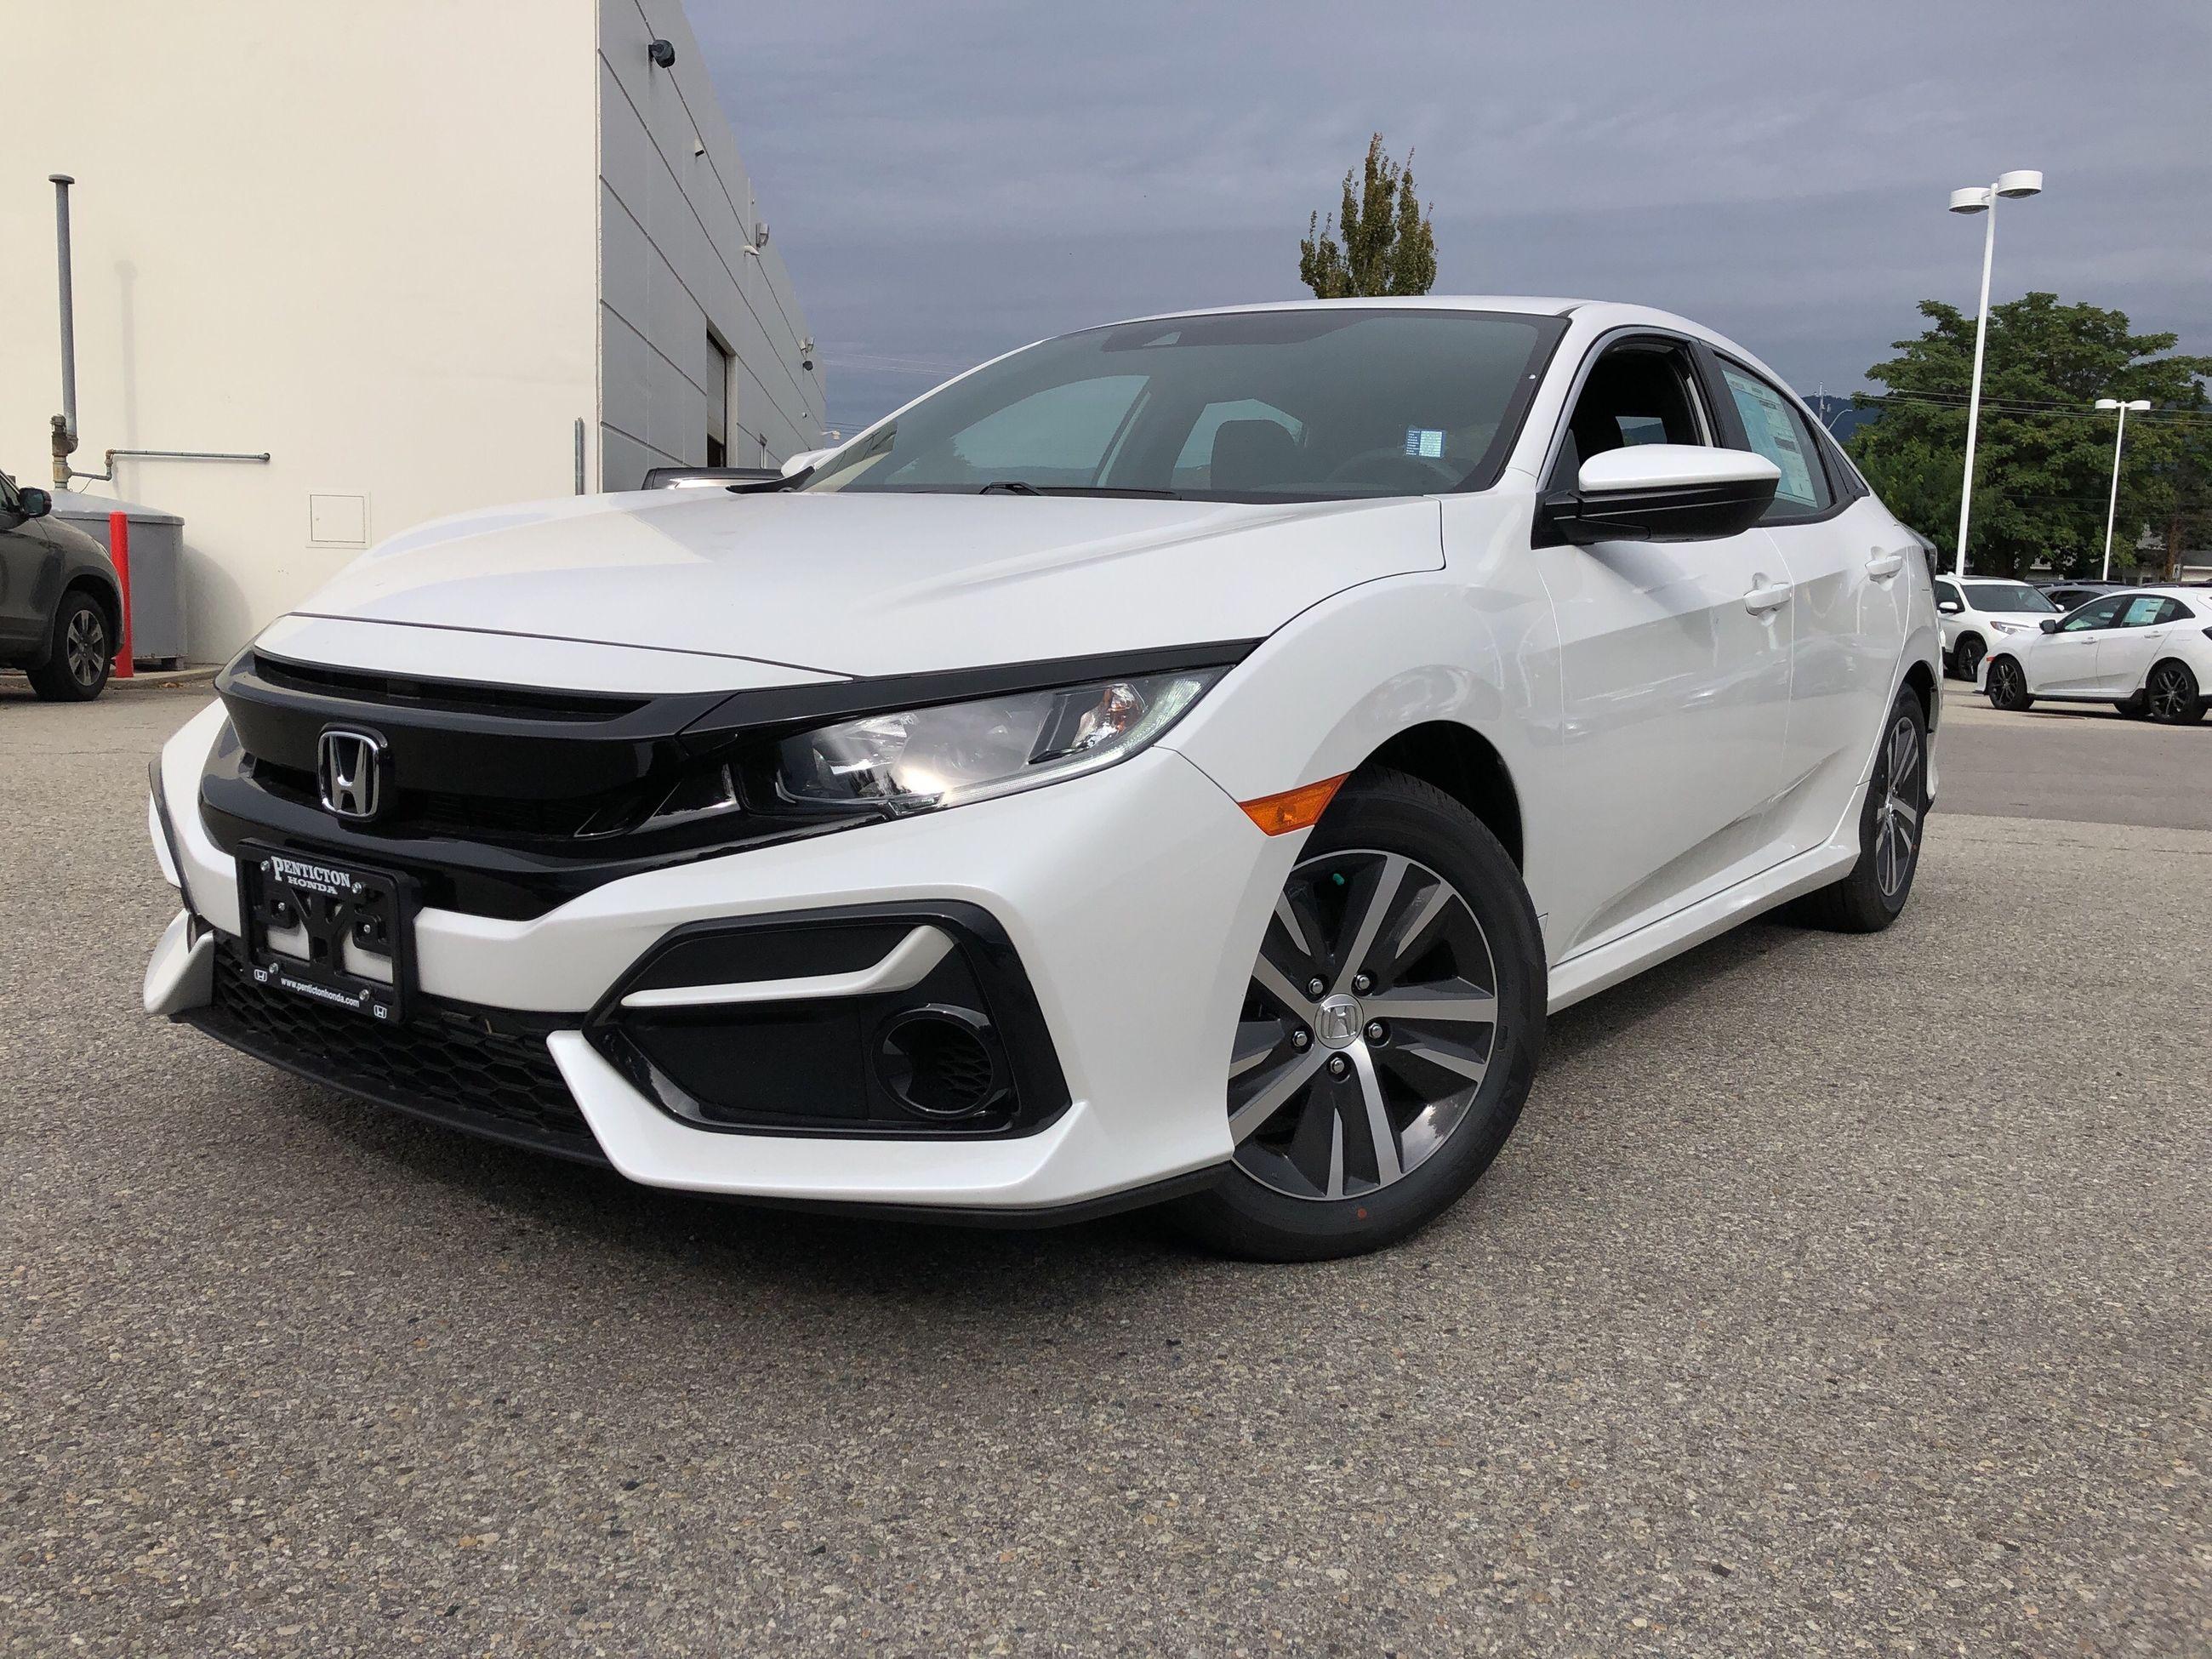 Honda Financing Offers >> Penticton Honda | 2020 Civic Hatchback LX CVT - #H20002